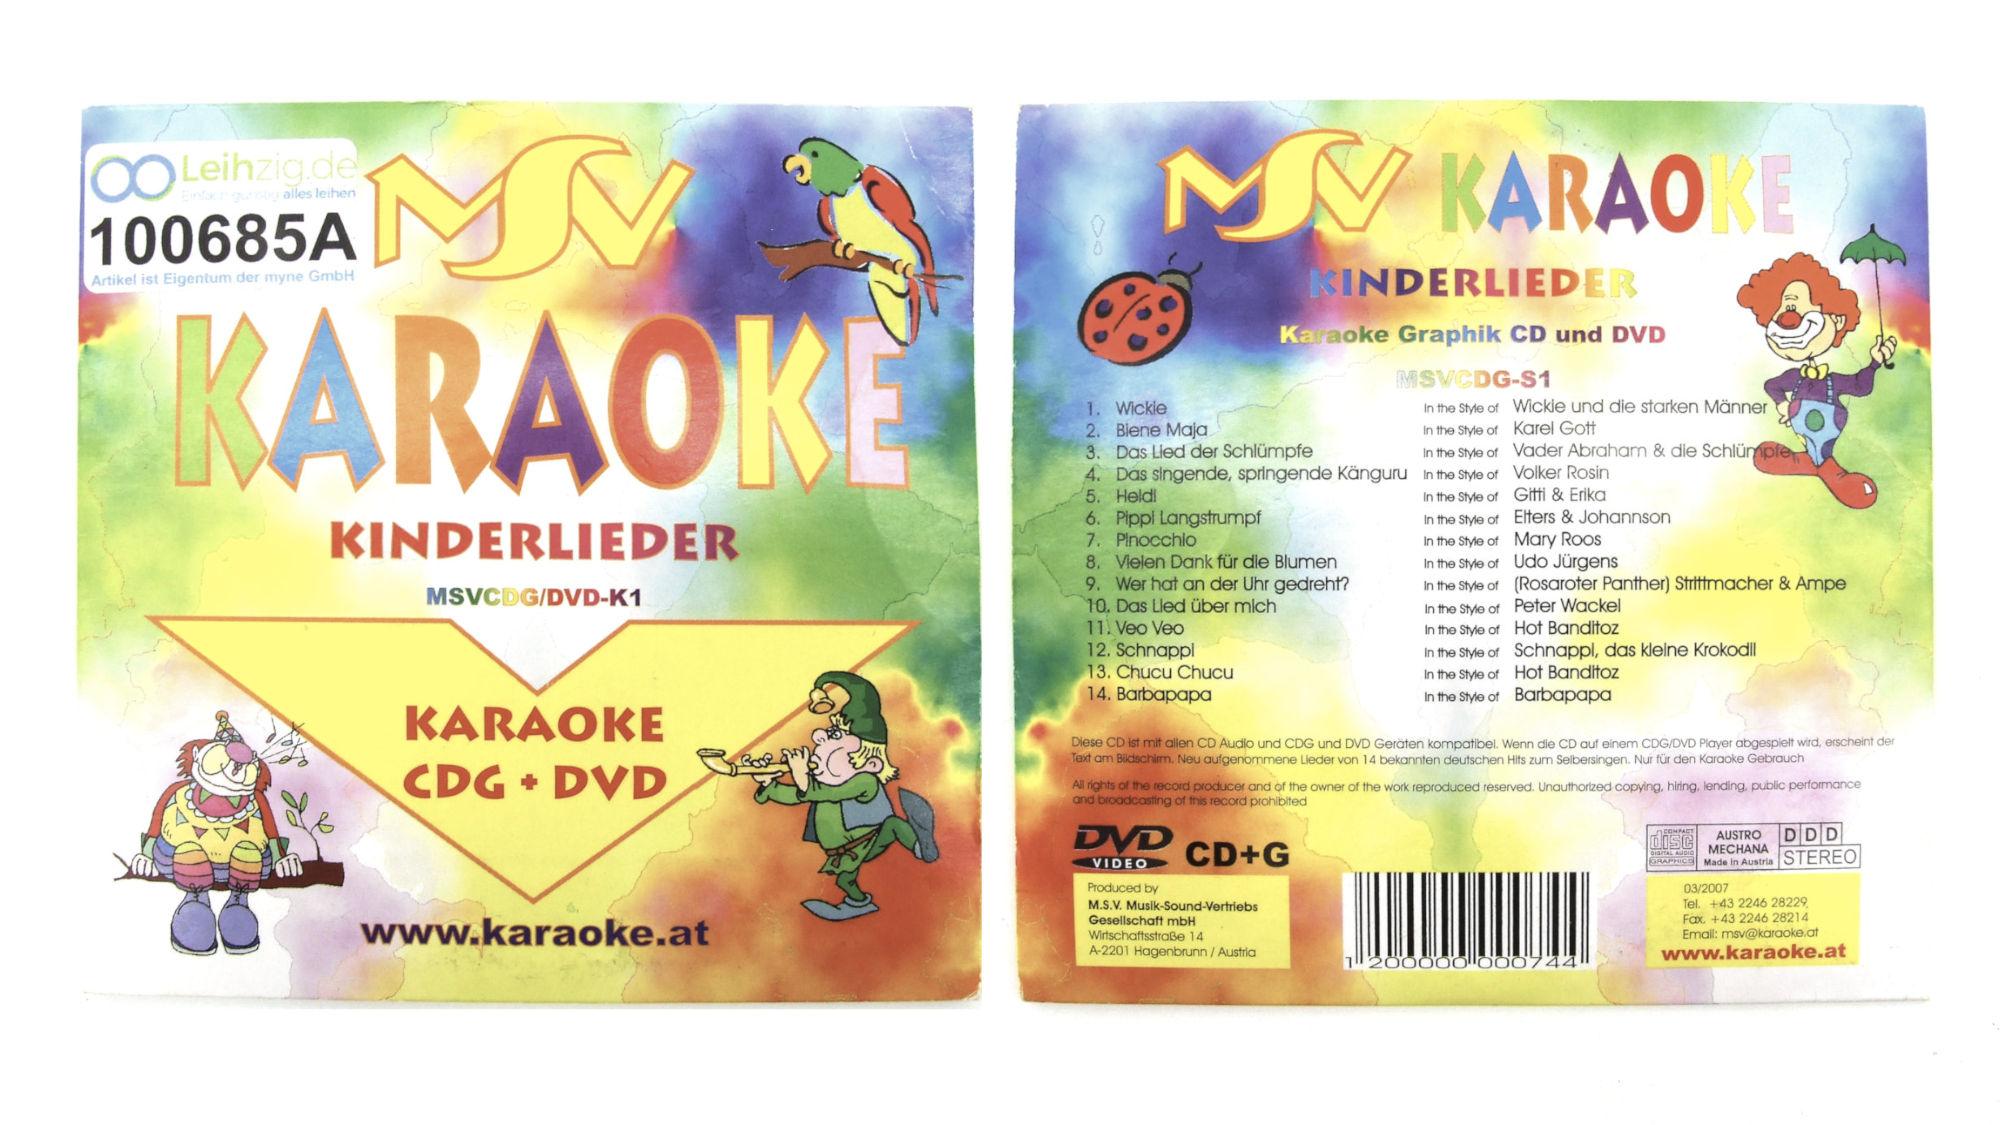 Karaoke CD Kinderlieder leihen